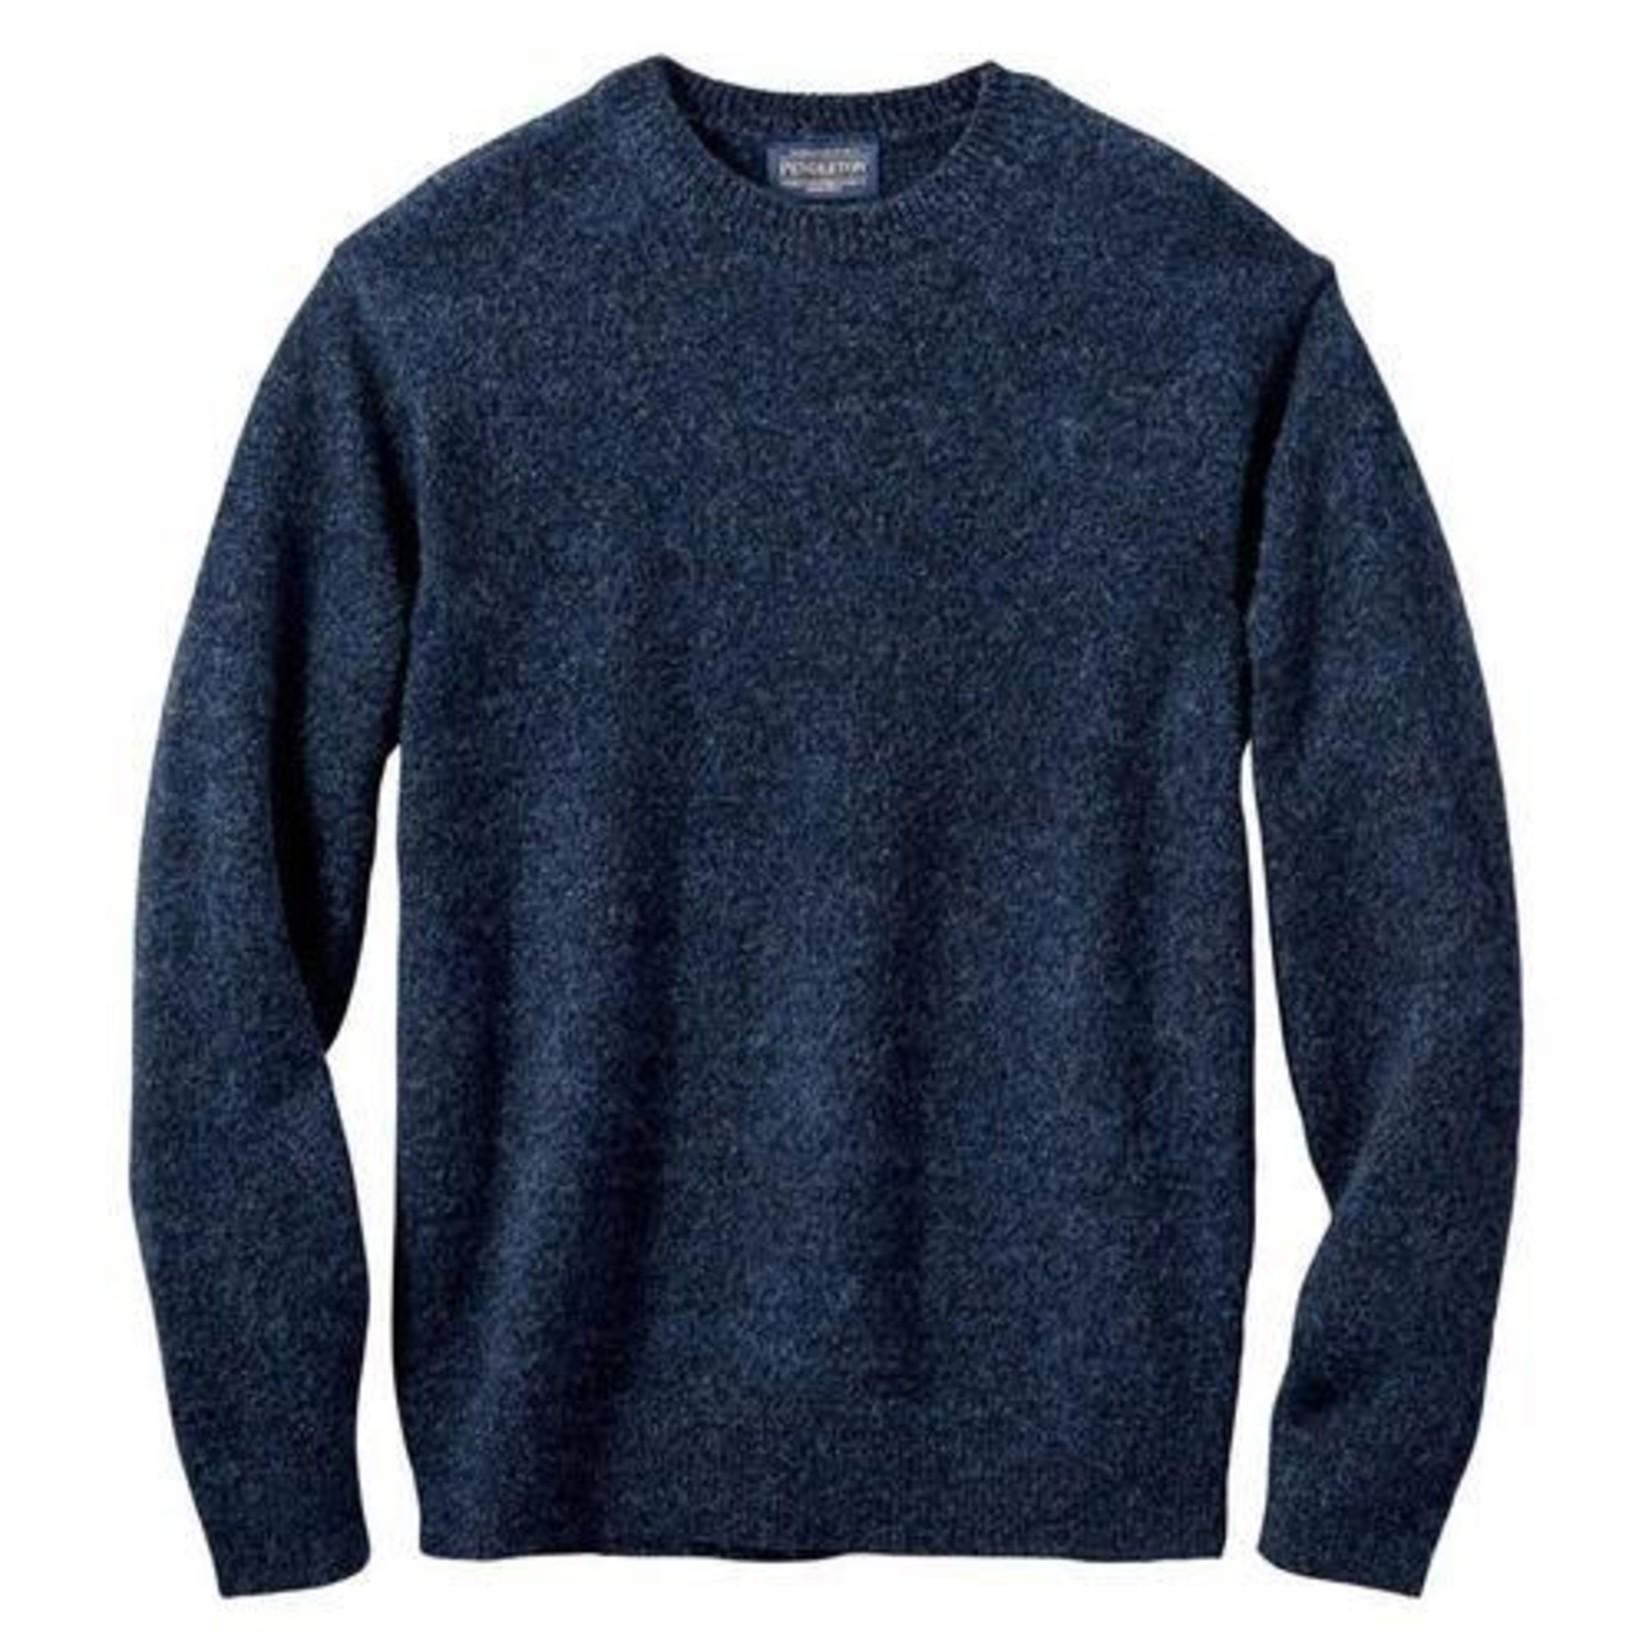 Pendleton Pendleton Shetland Crew Sweater RF532-63630